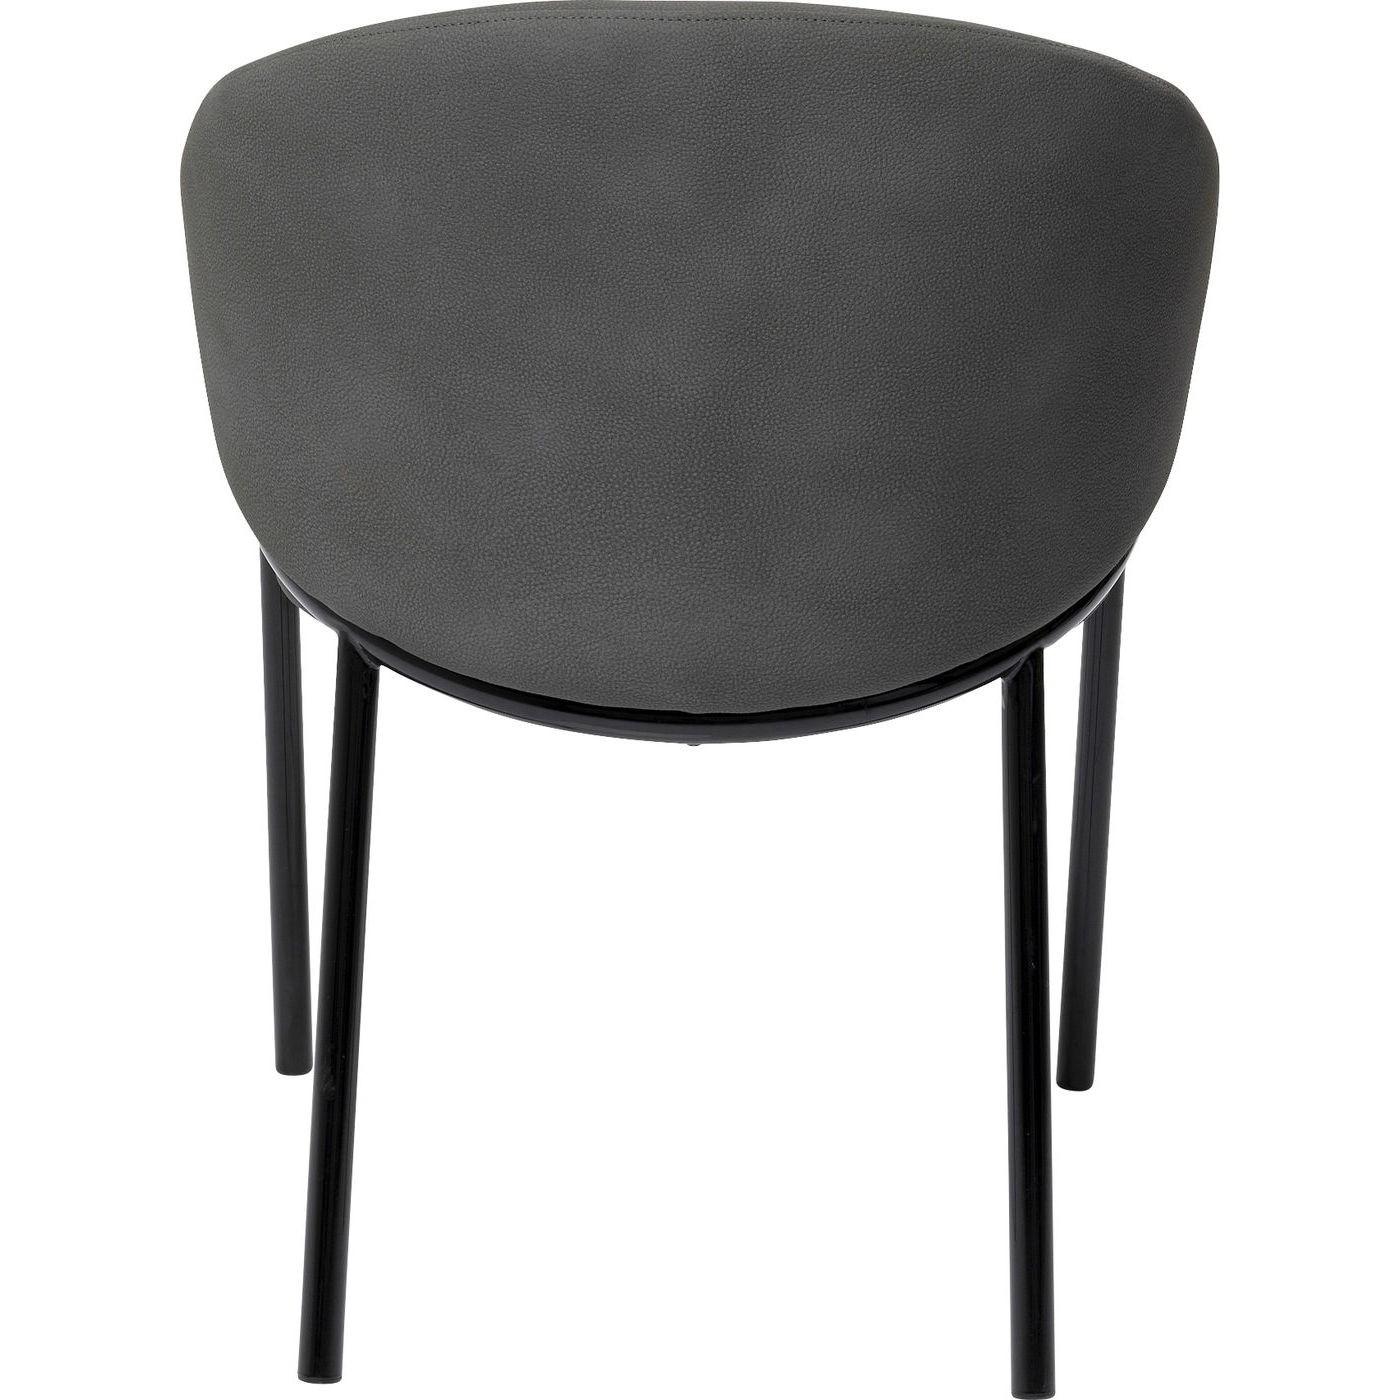 Chaise avec accoudoirs Boulevard grise Kare Design